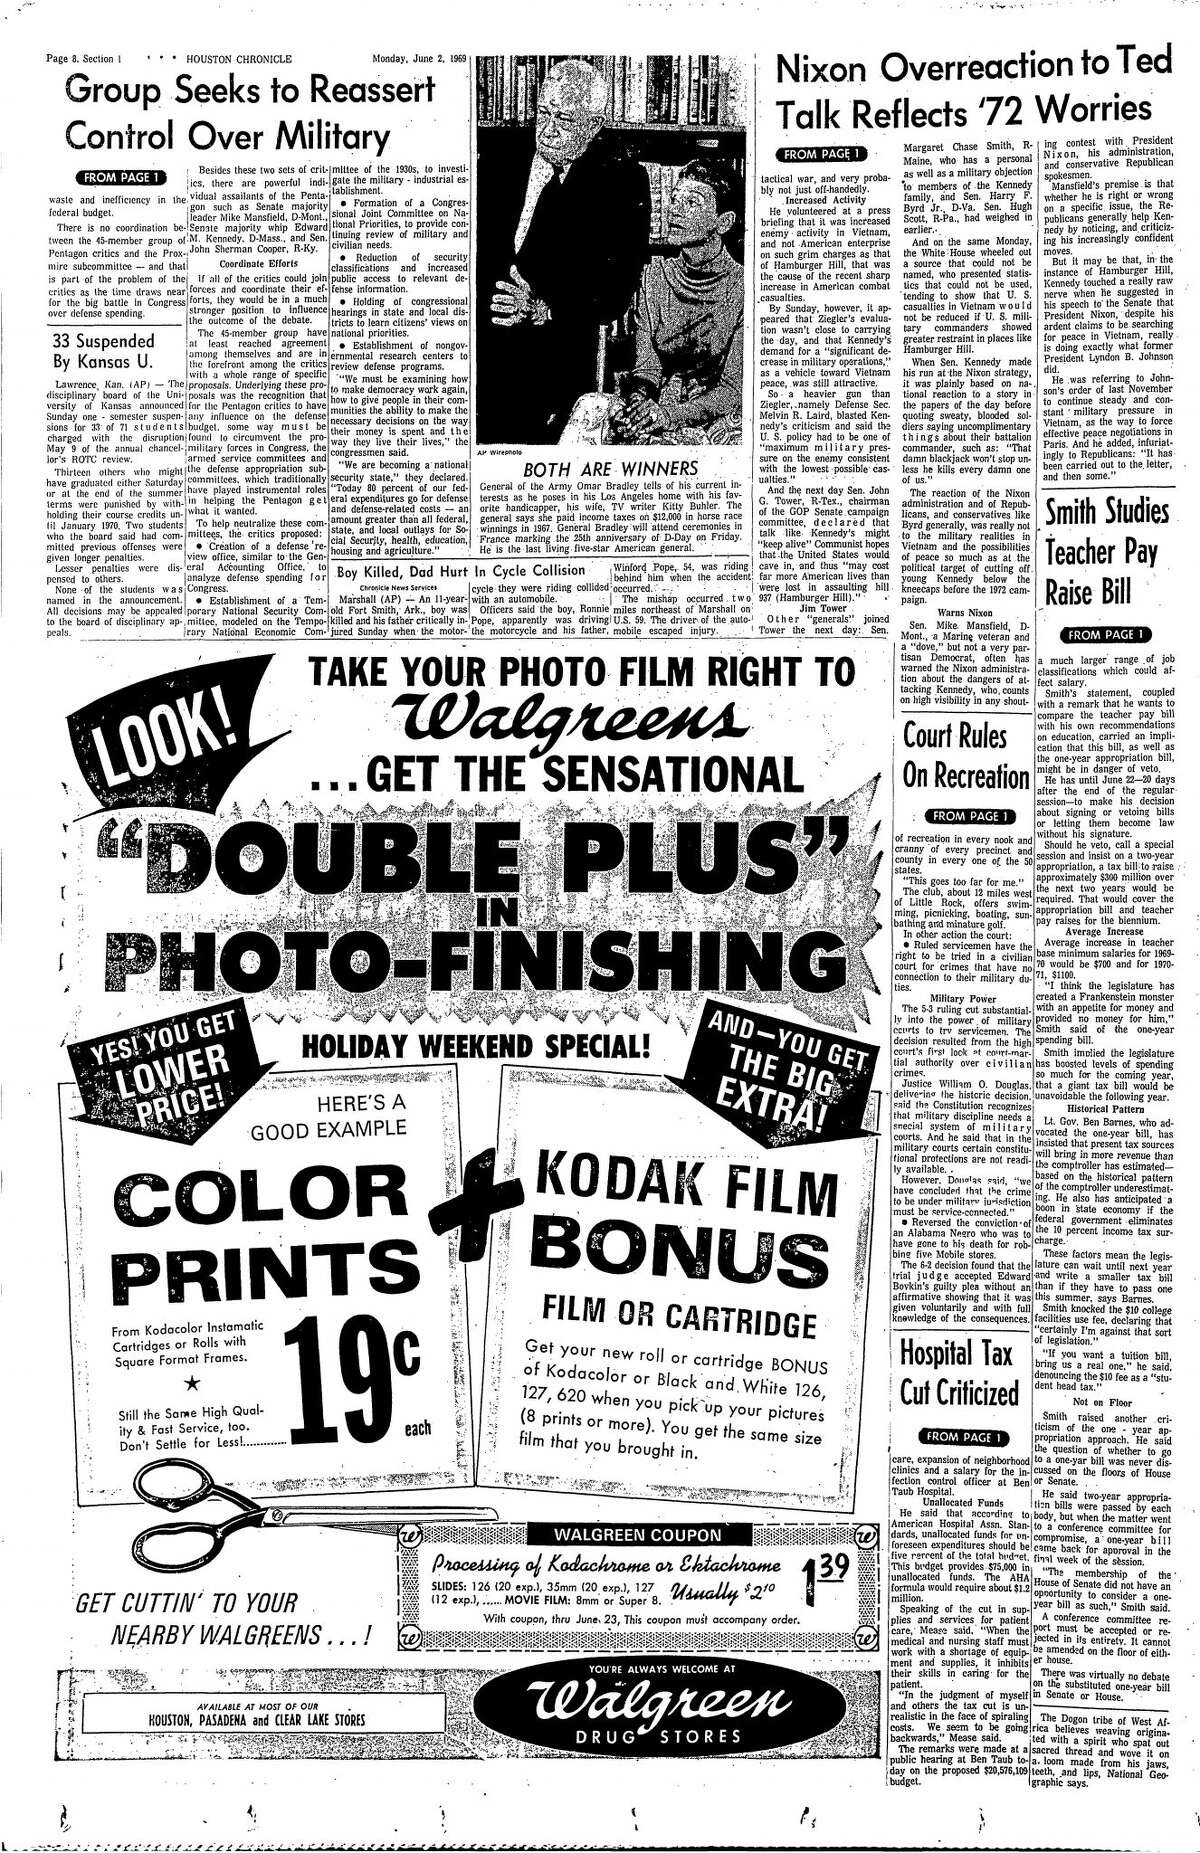 June 2, 1969